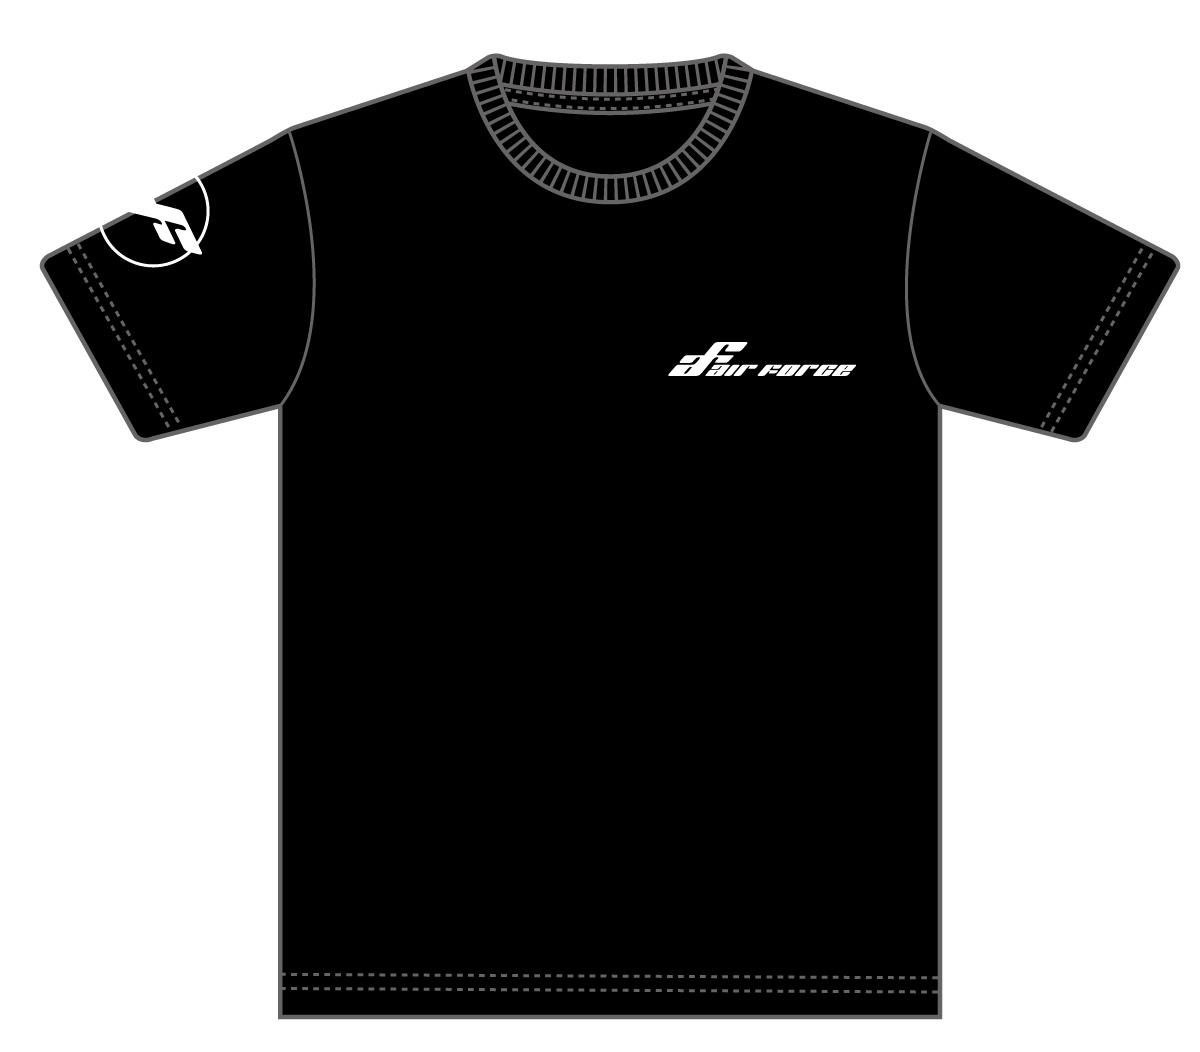 Air Force Suspension オリジナルTシャツ